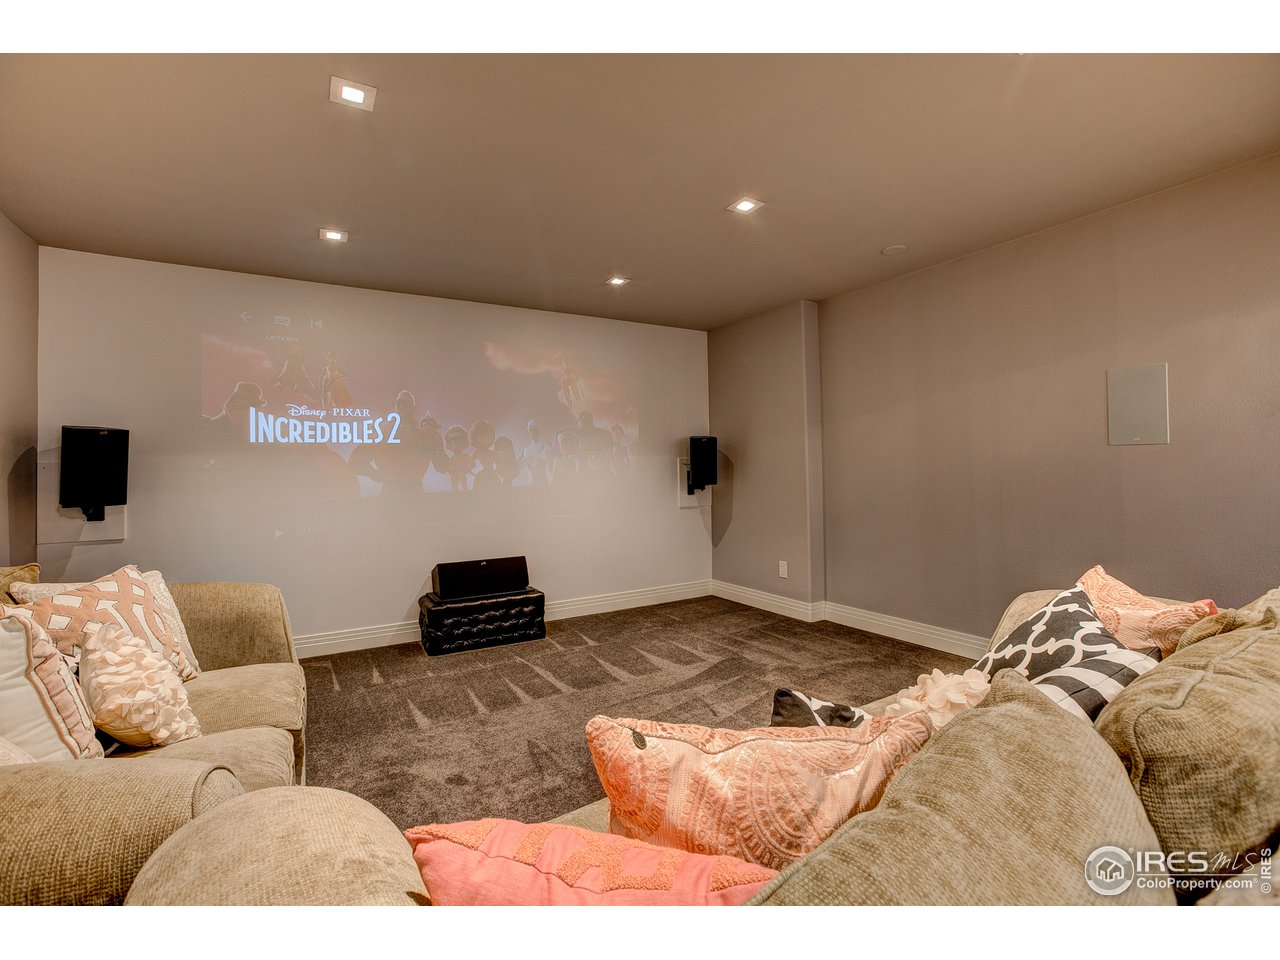 Basement theatre w/ projector